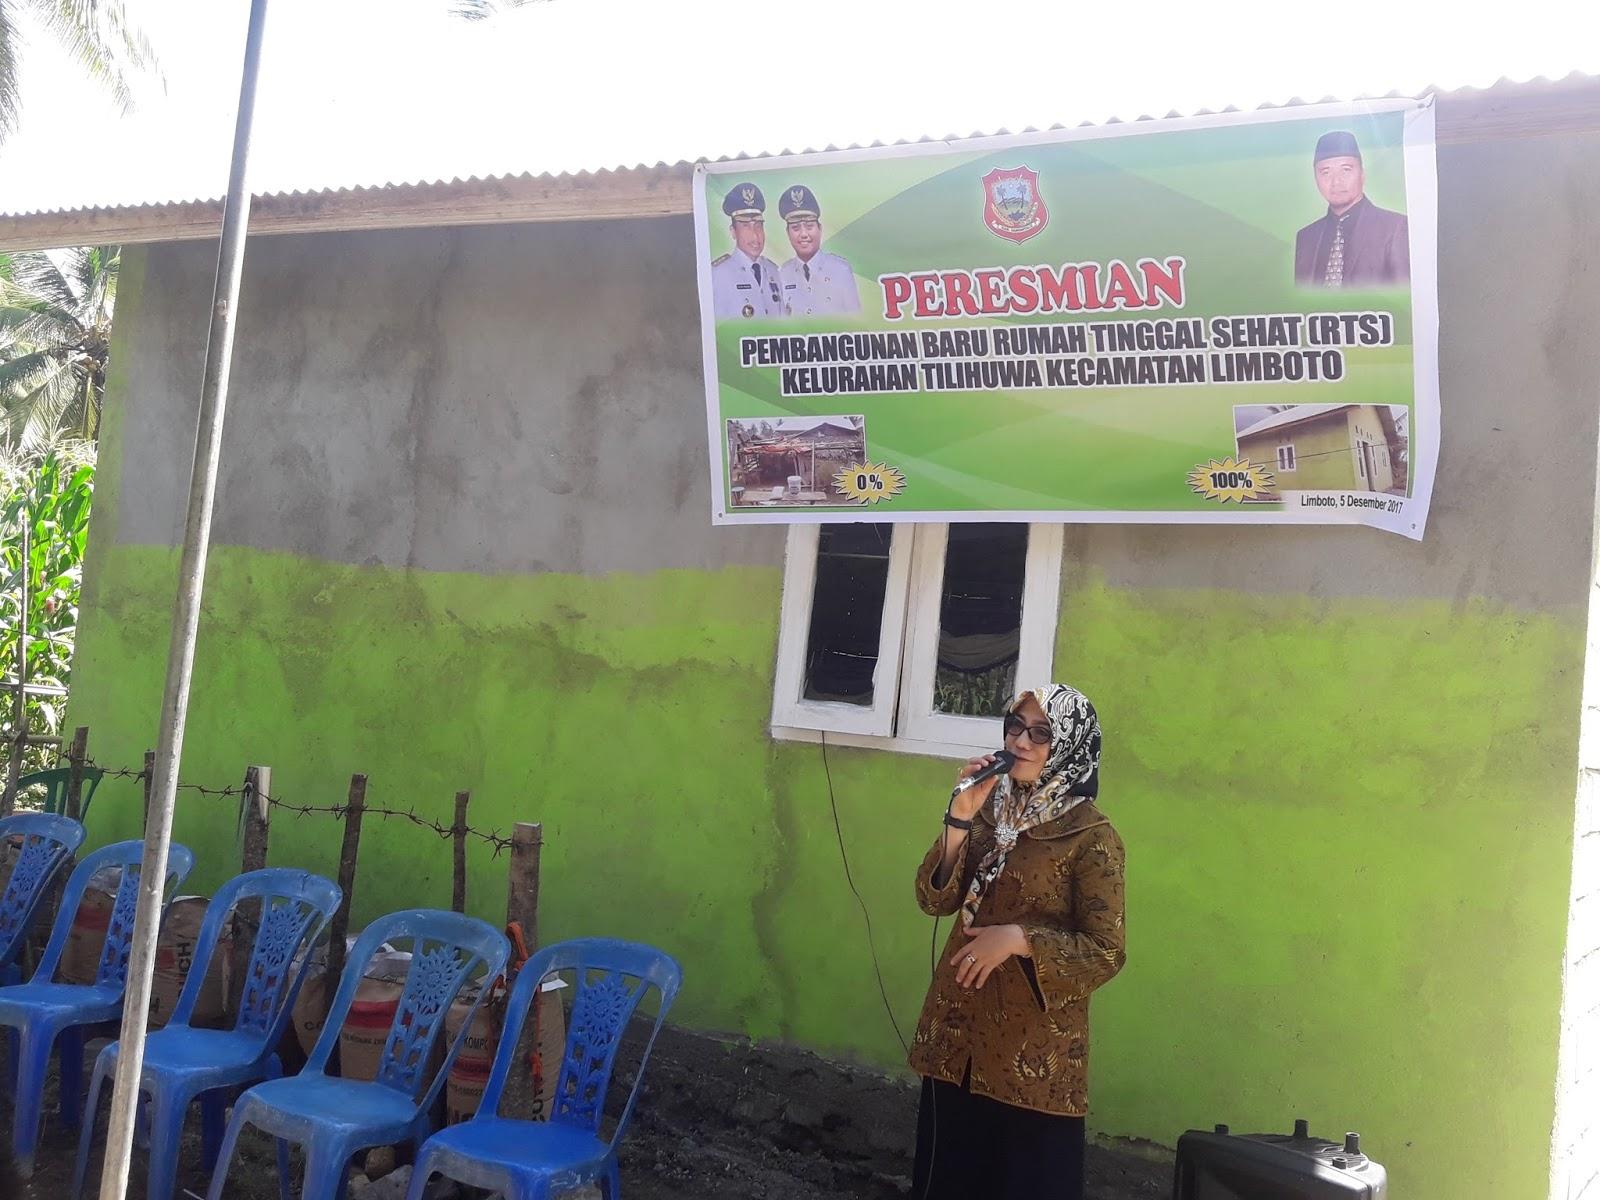 Nafascita Bedah Rumah Ala Pkk Kabupaten Gorontalo Tersebut Berkat Kolaborasi